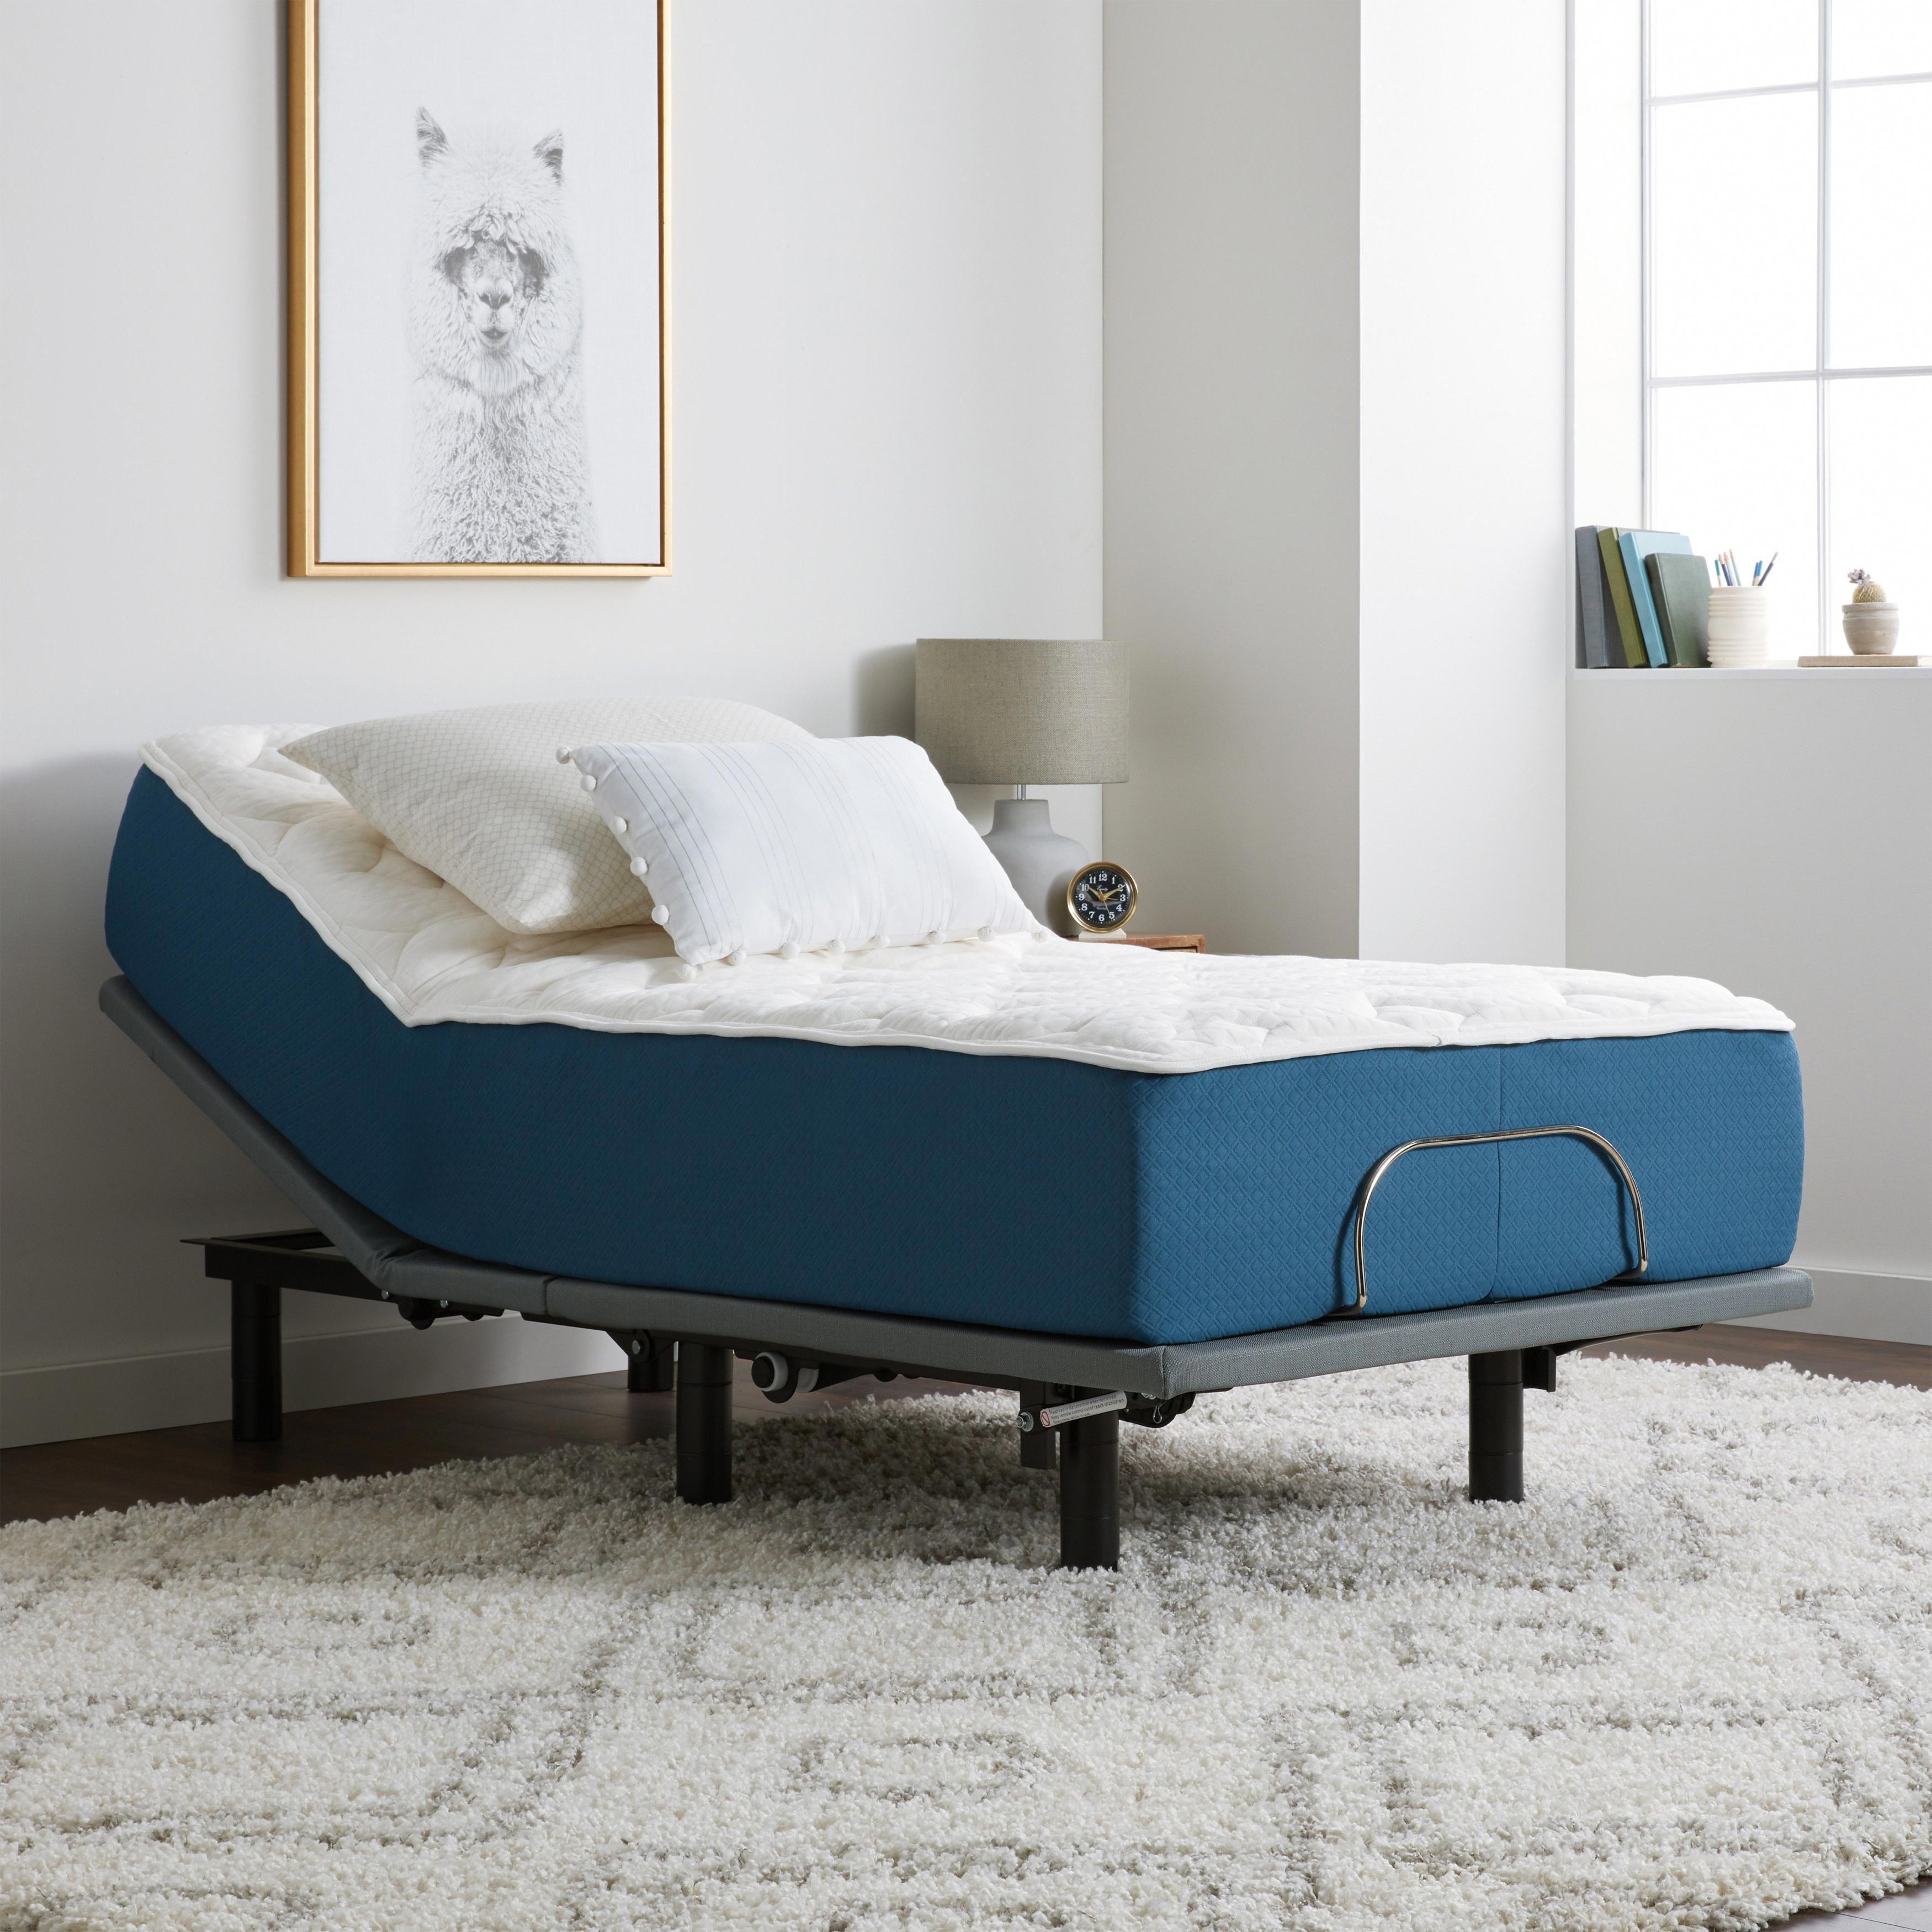 17 Incredible Foam Mattress Amazon Basics Foam Mattress And Box Spring Set Full Furnituremakeover Furniturek Foam Sofa Bed Memory Foam Sofa Sofa Bed Mattress